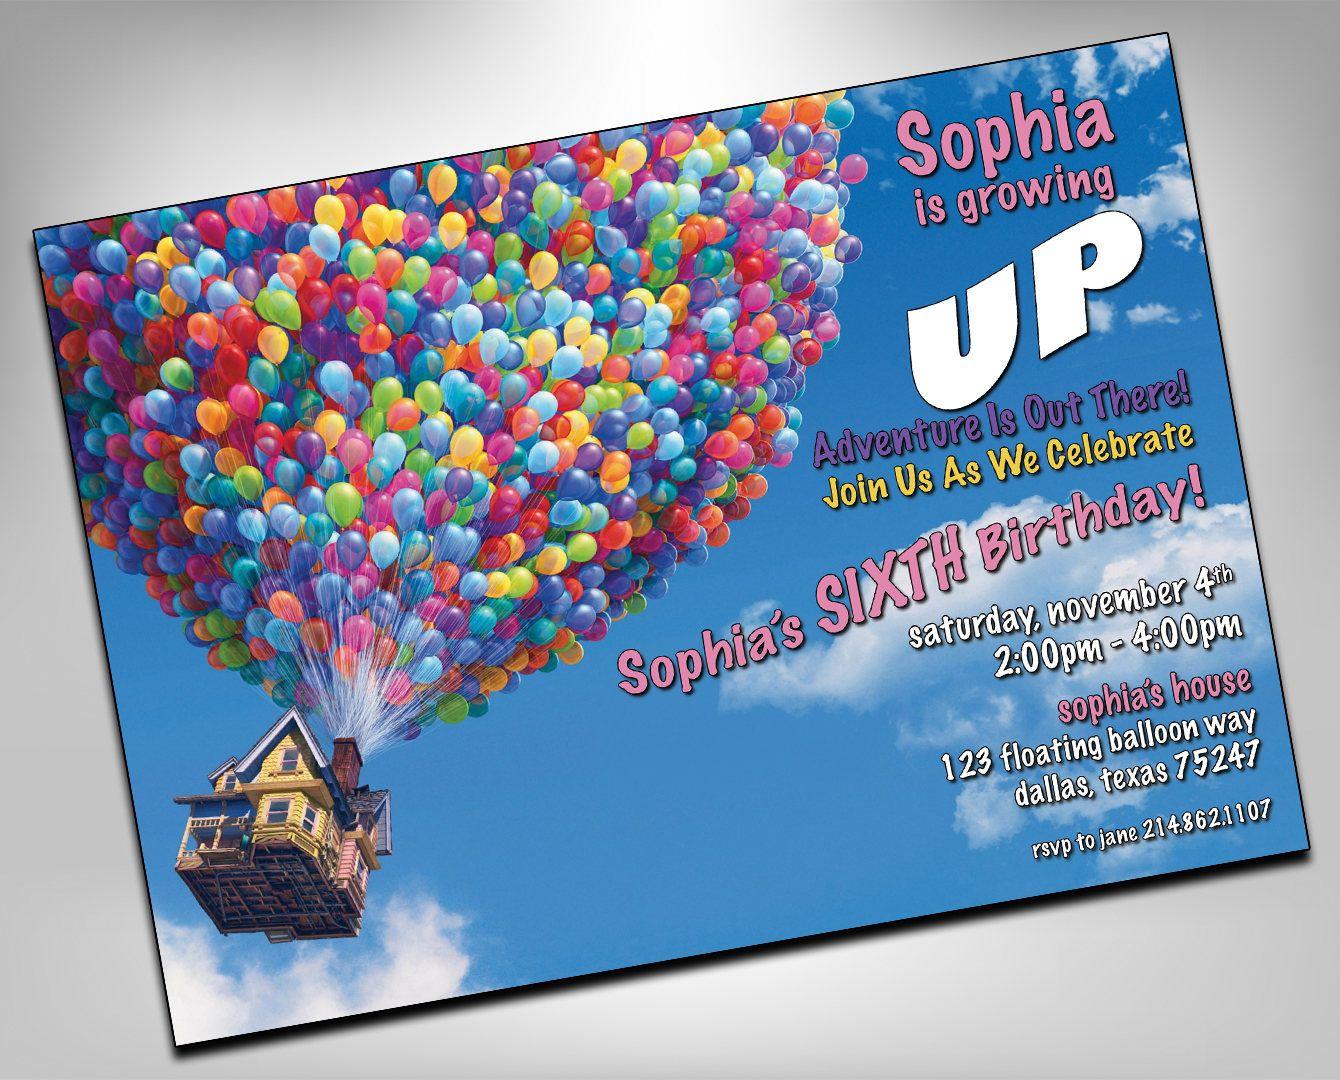 Up Birthday Invitation, Up Birthday, Up up and Away, UP Birthday ...